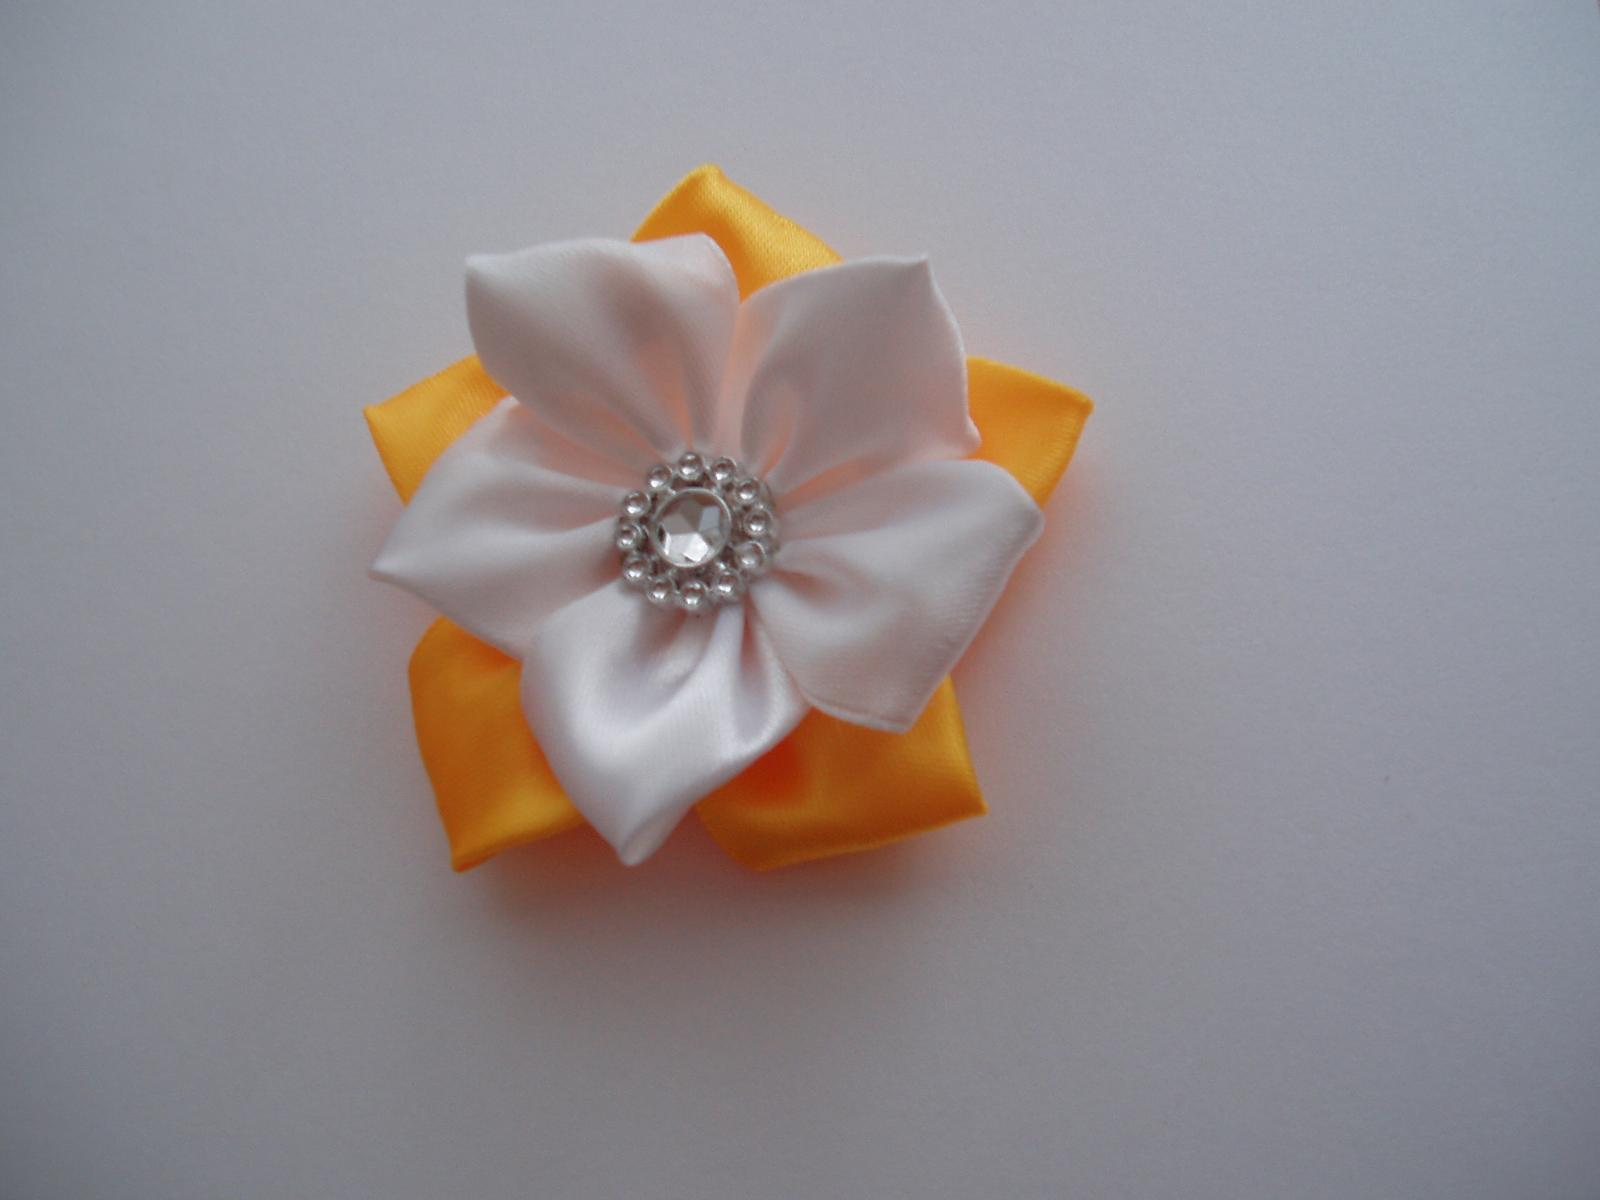 kytička žluto-bílá - Obrázek č. 1